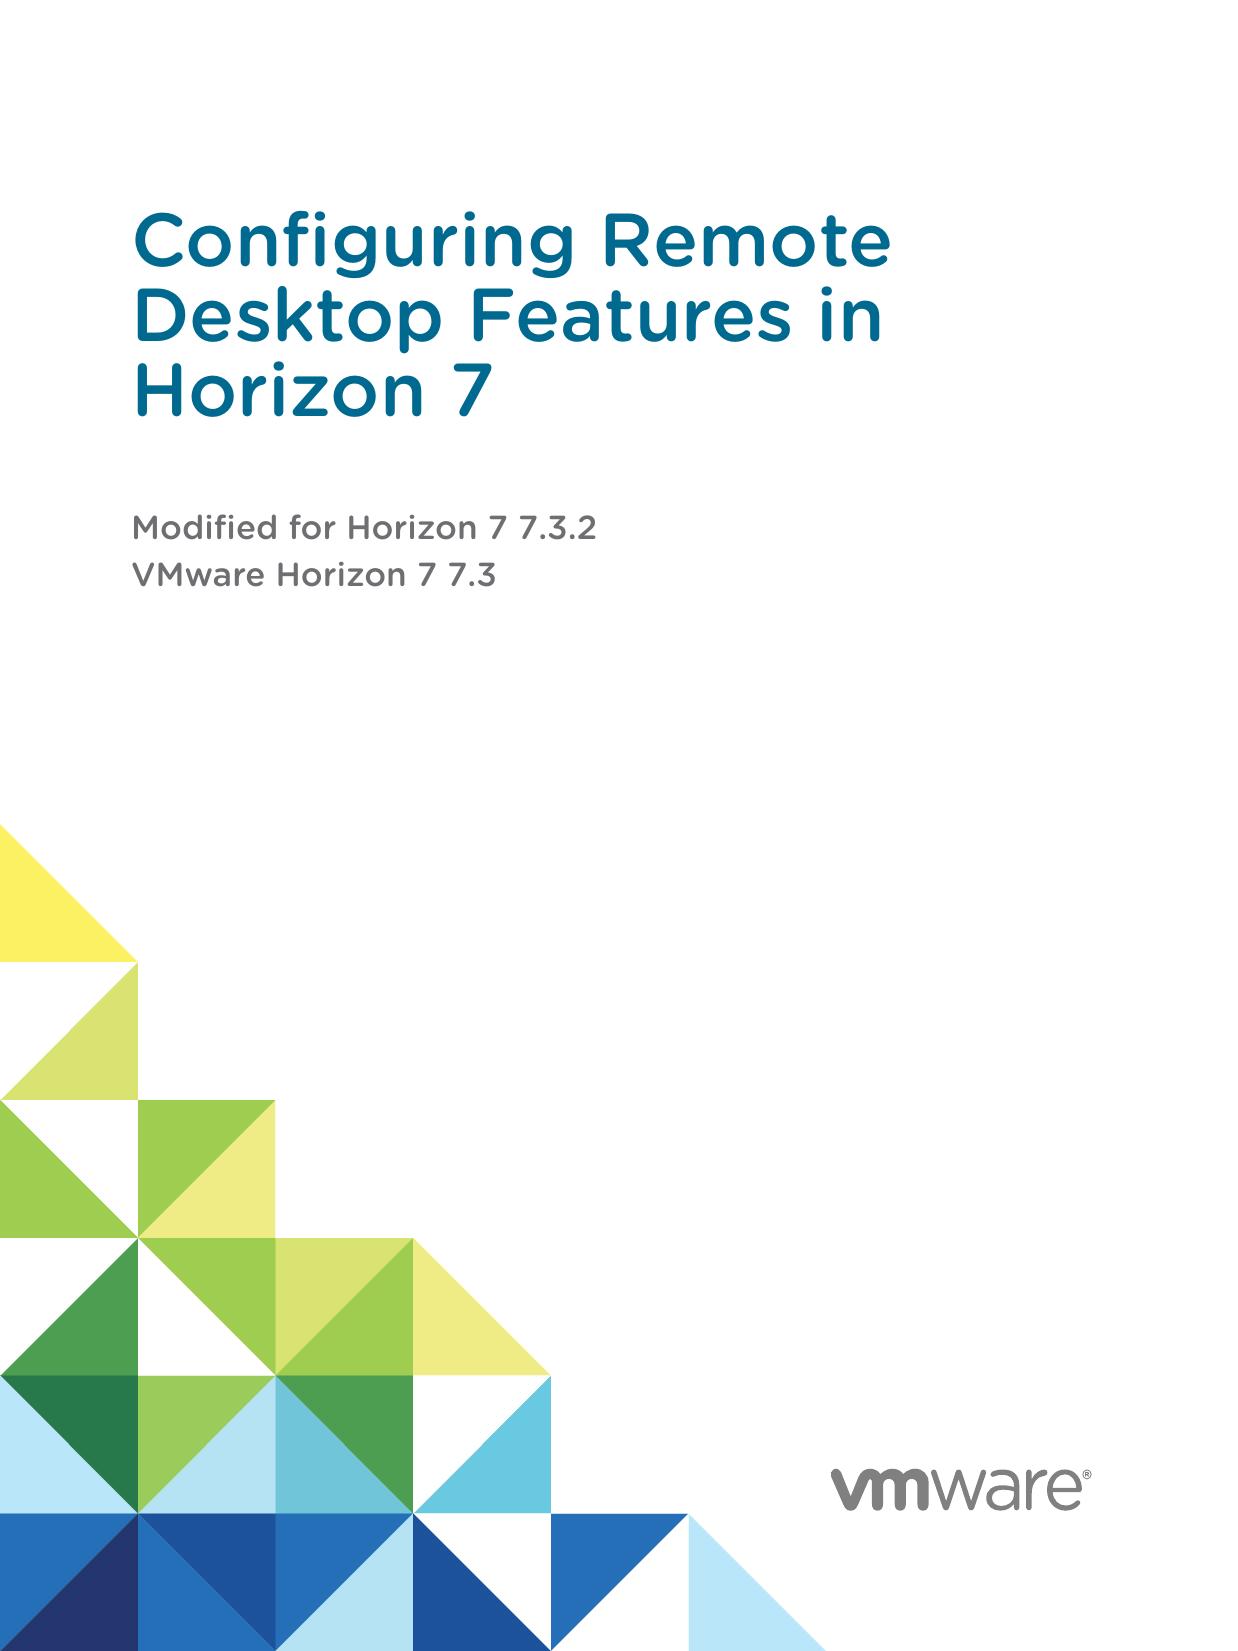 Configuring Remote Desktop Features in Horizon 7 | manualzz com